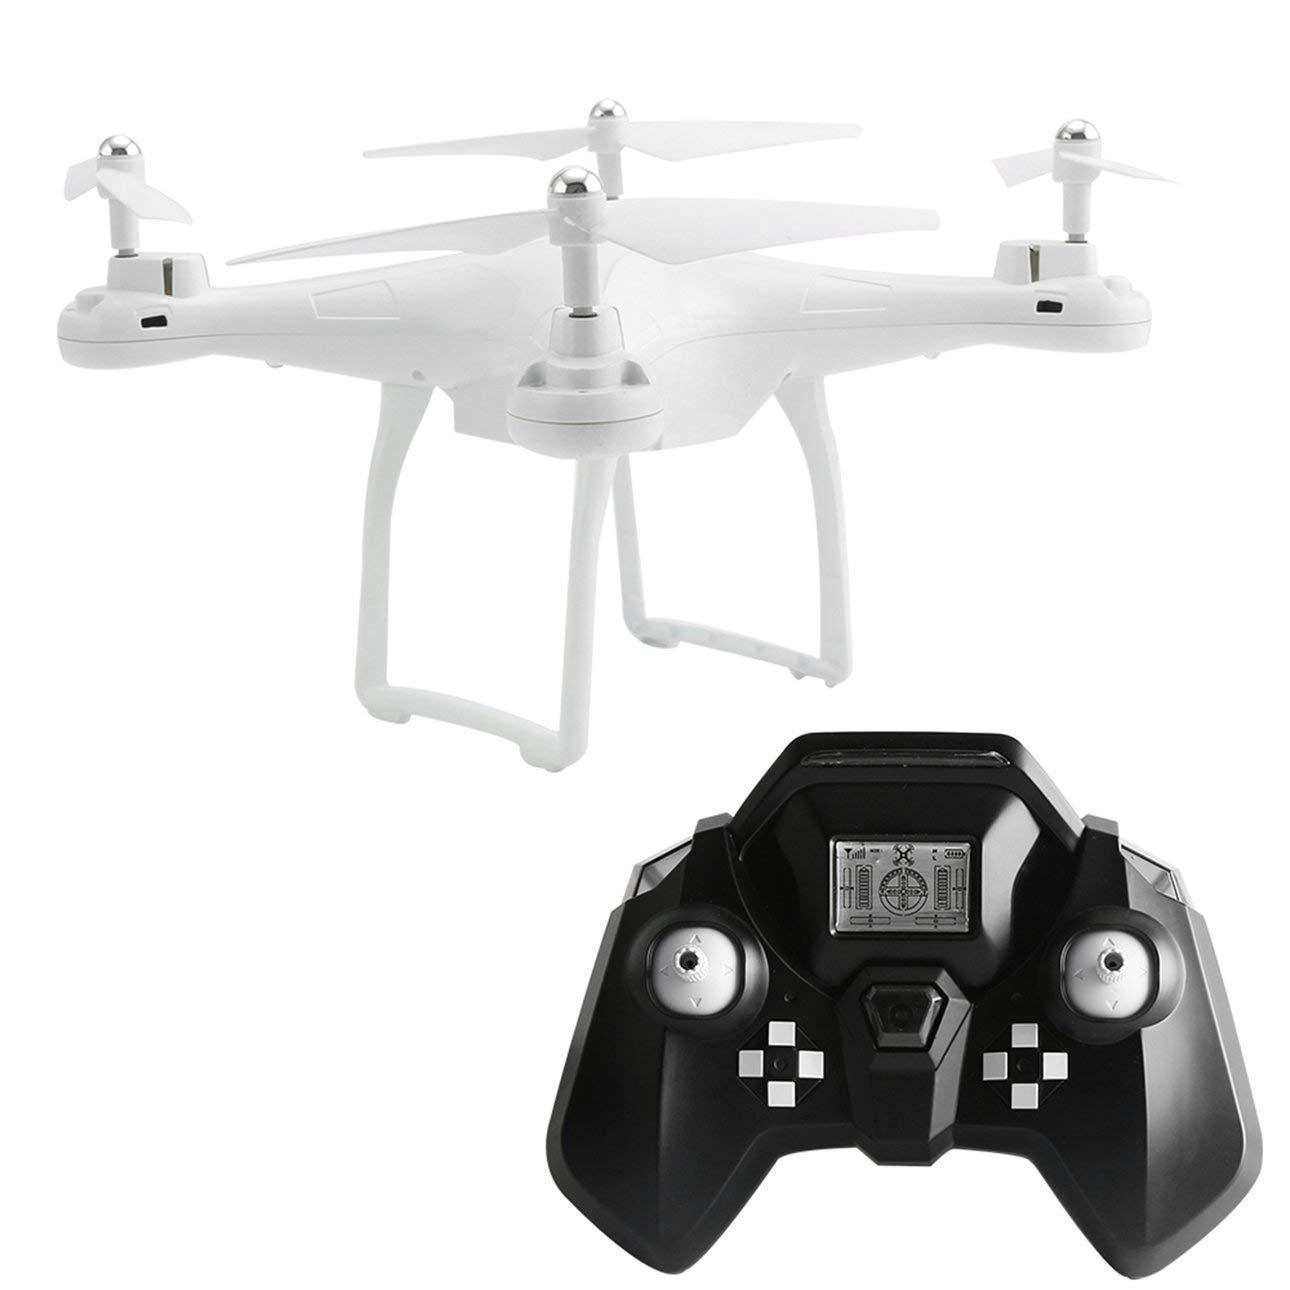 Liobaba S10 2.4G RC Drone LED Light Headless Mode One Key Return 3D Flips Mini Remote Control Quadrocopter Children